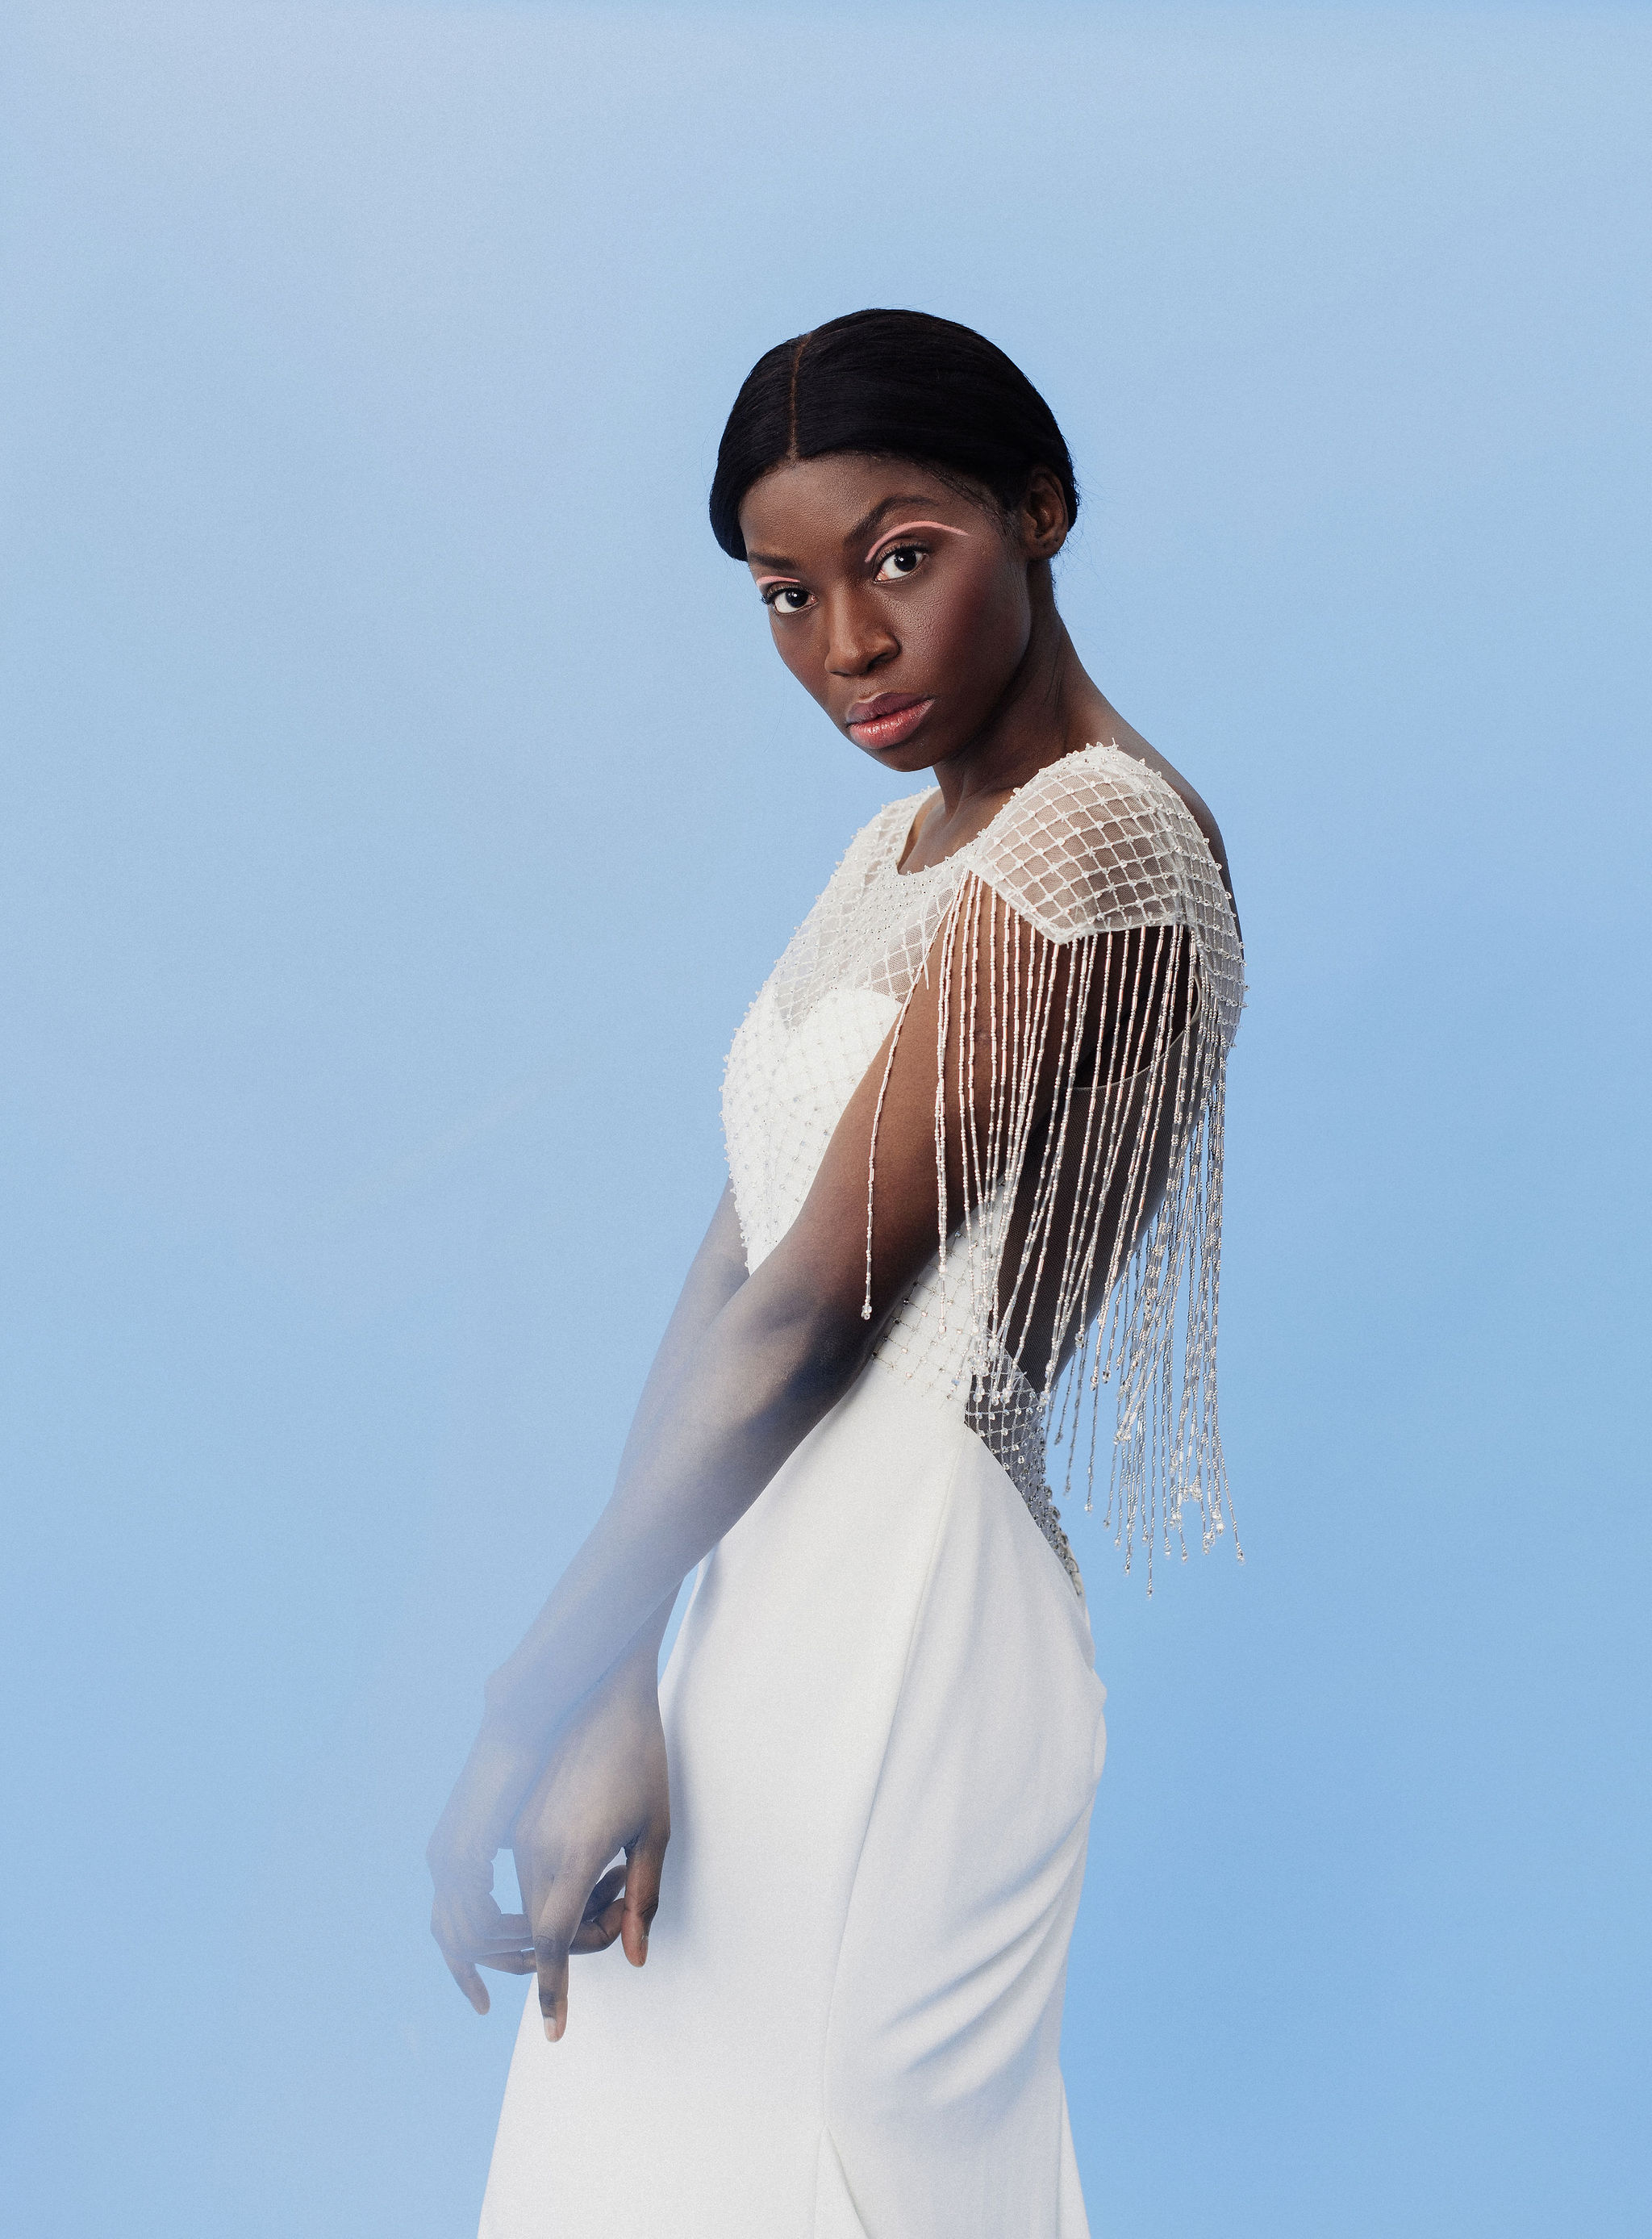 Maggie Sottero Designs  Photographer: Eden Strader  Model: Moe M.  Makeup Artist: Abigail Hill